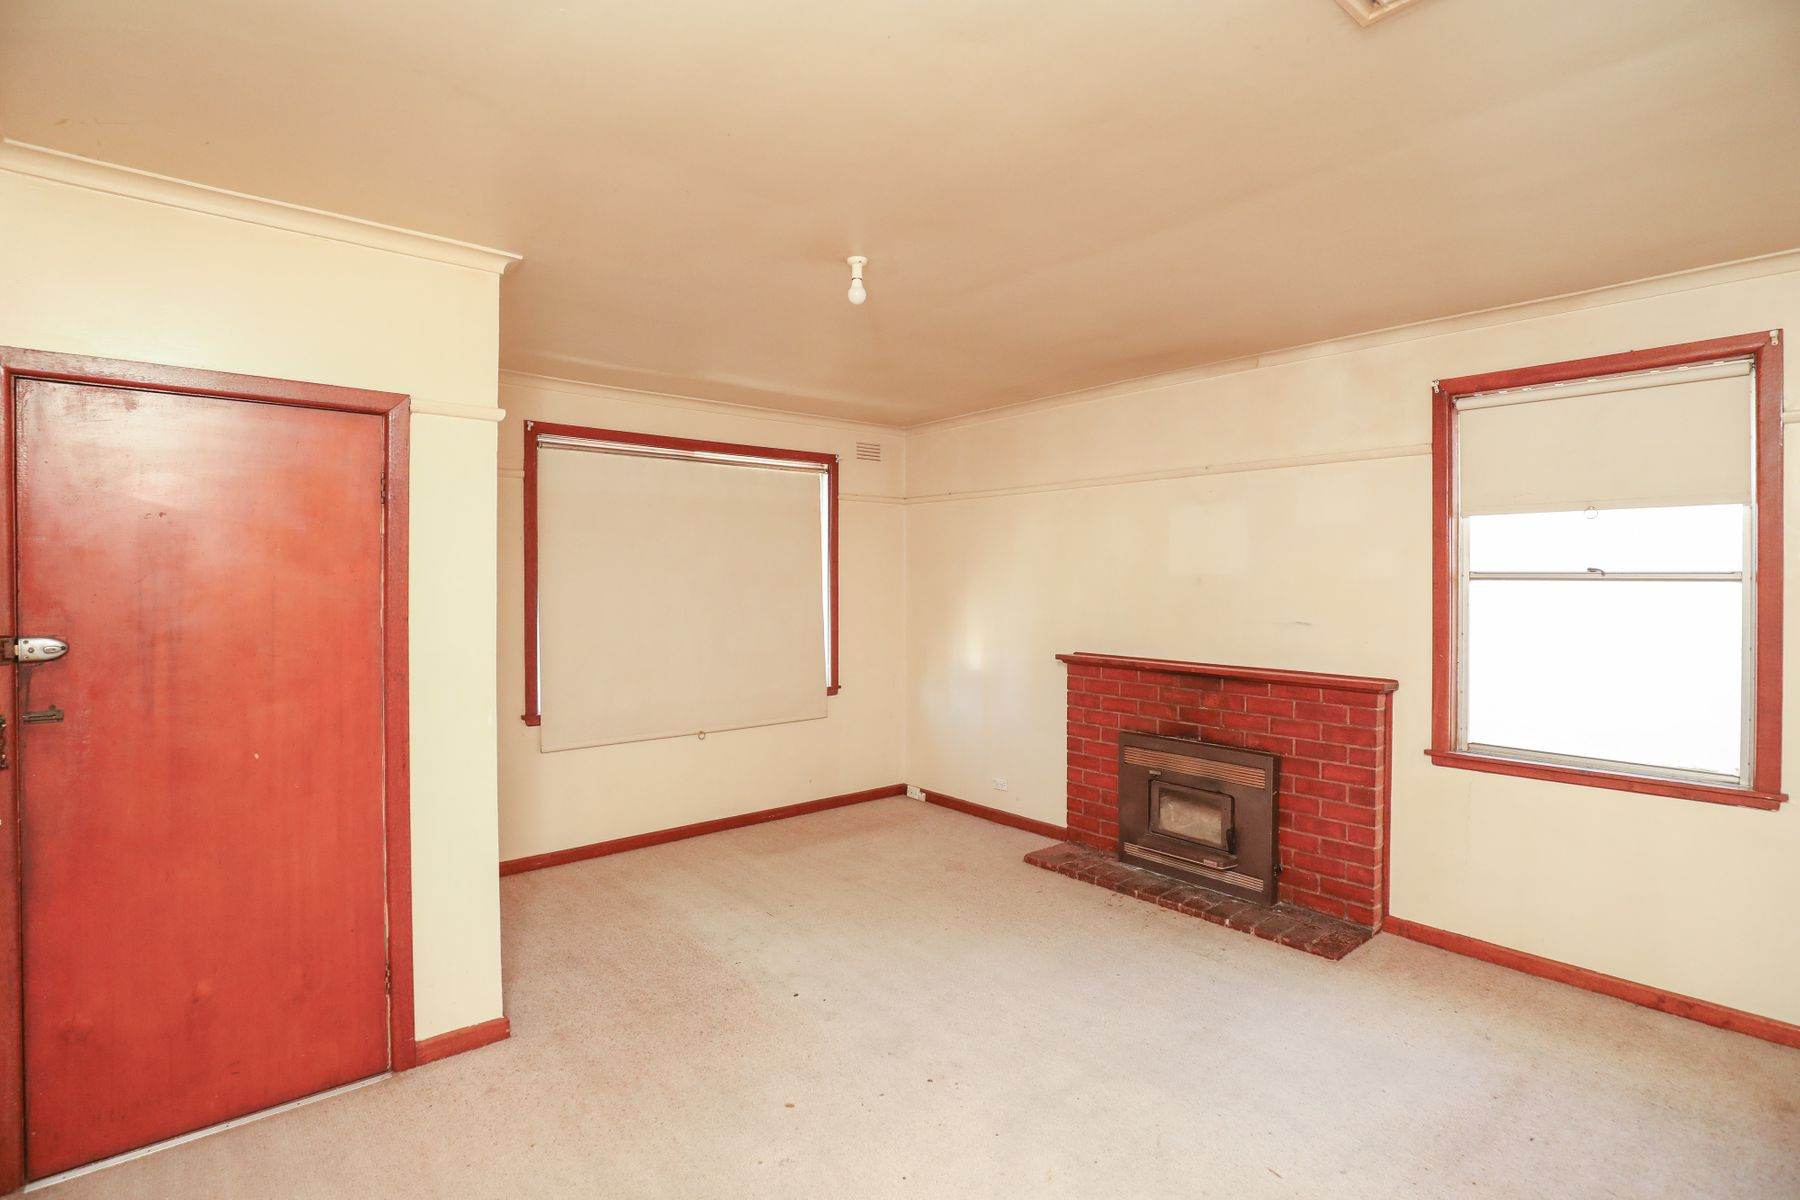 20 Namoi Avenue, Red Cliffs, VIC 3496